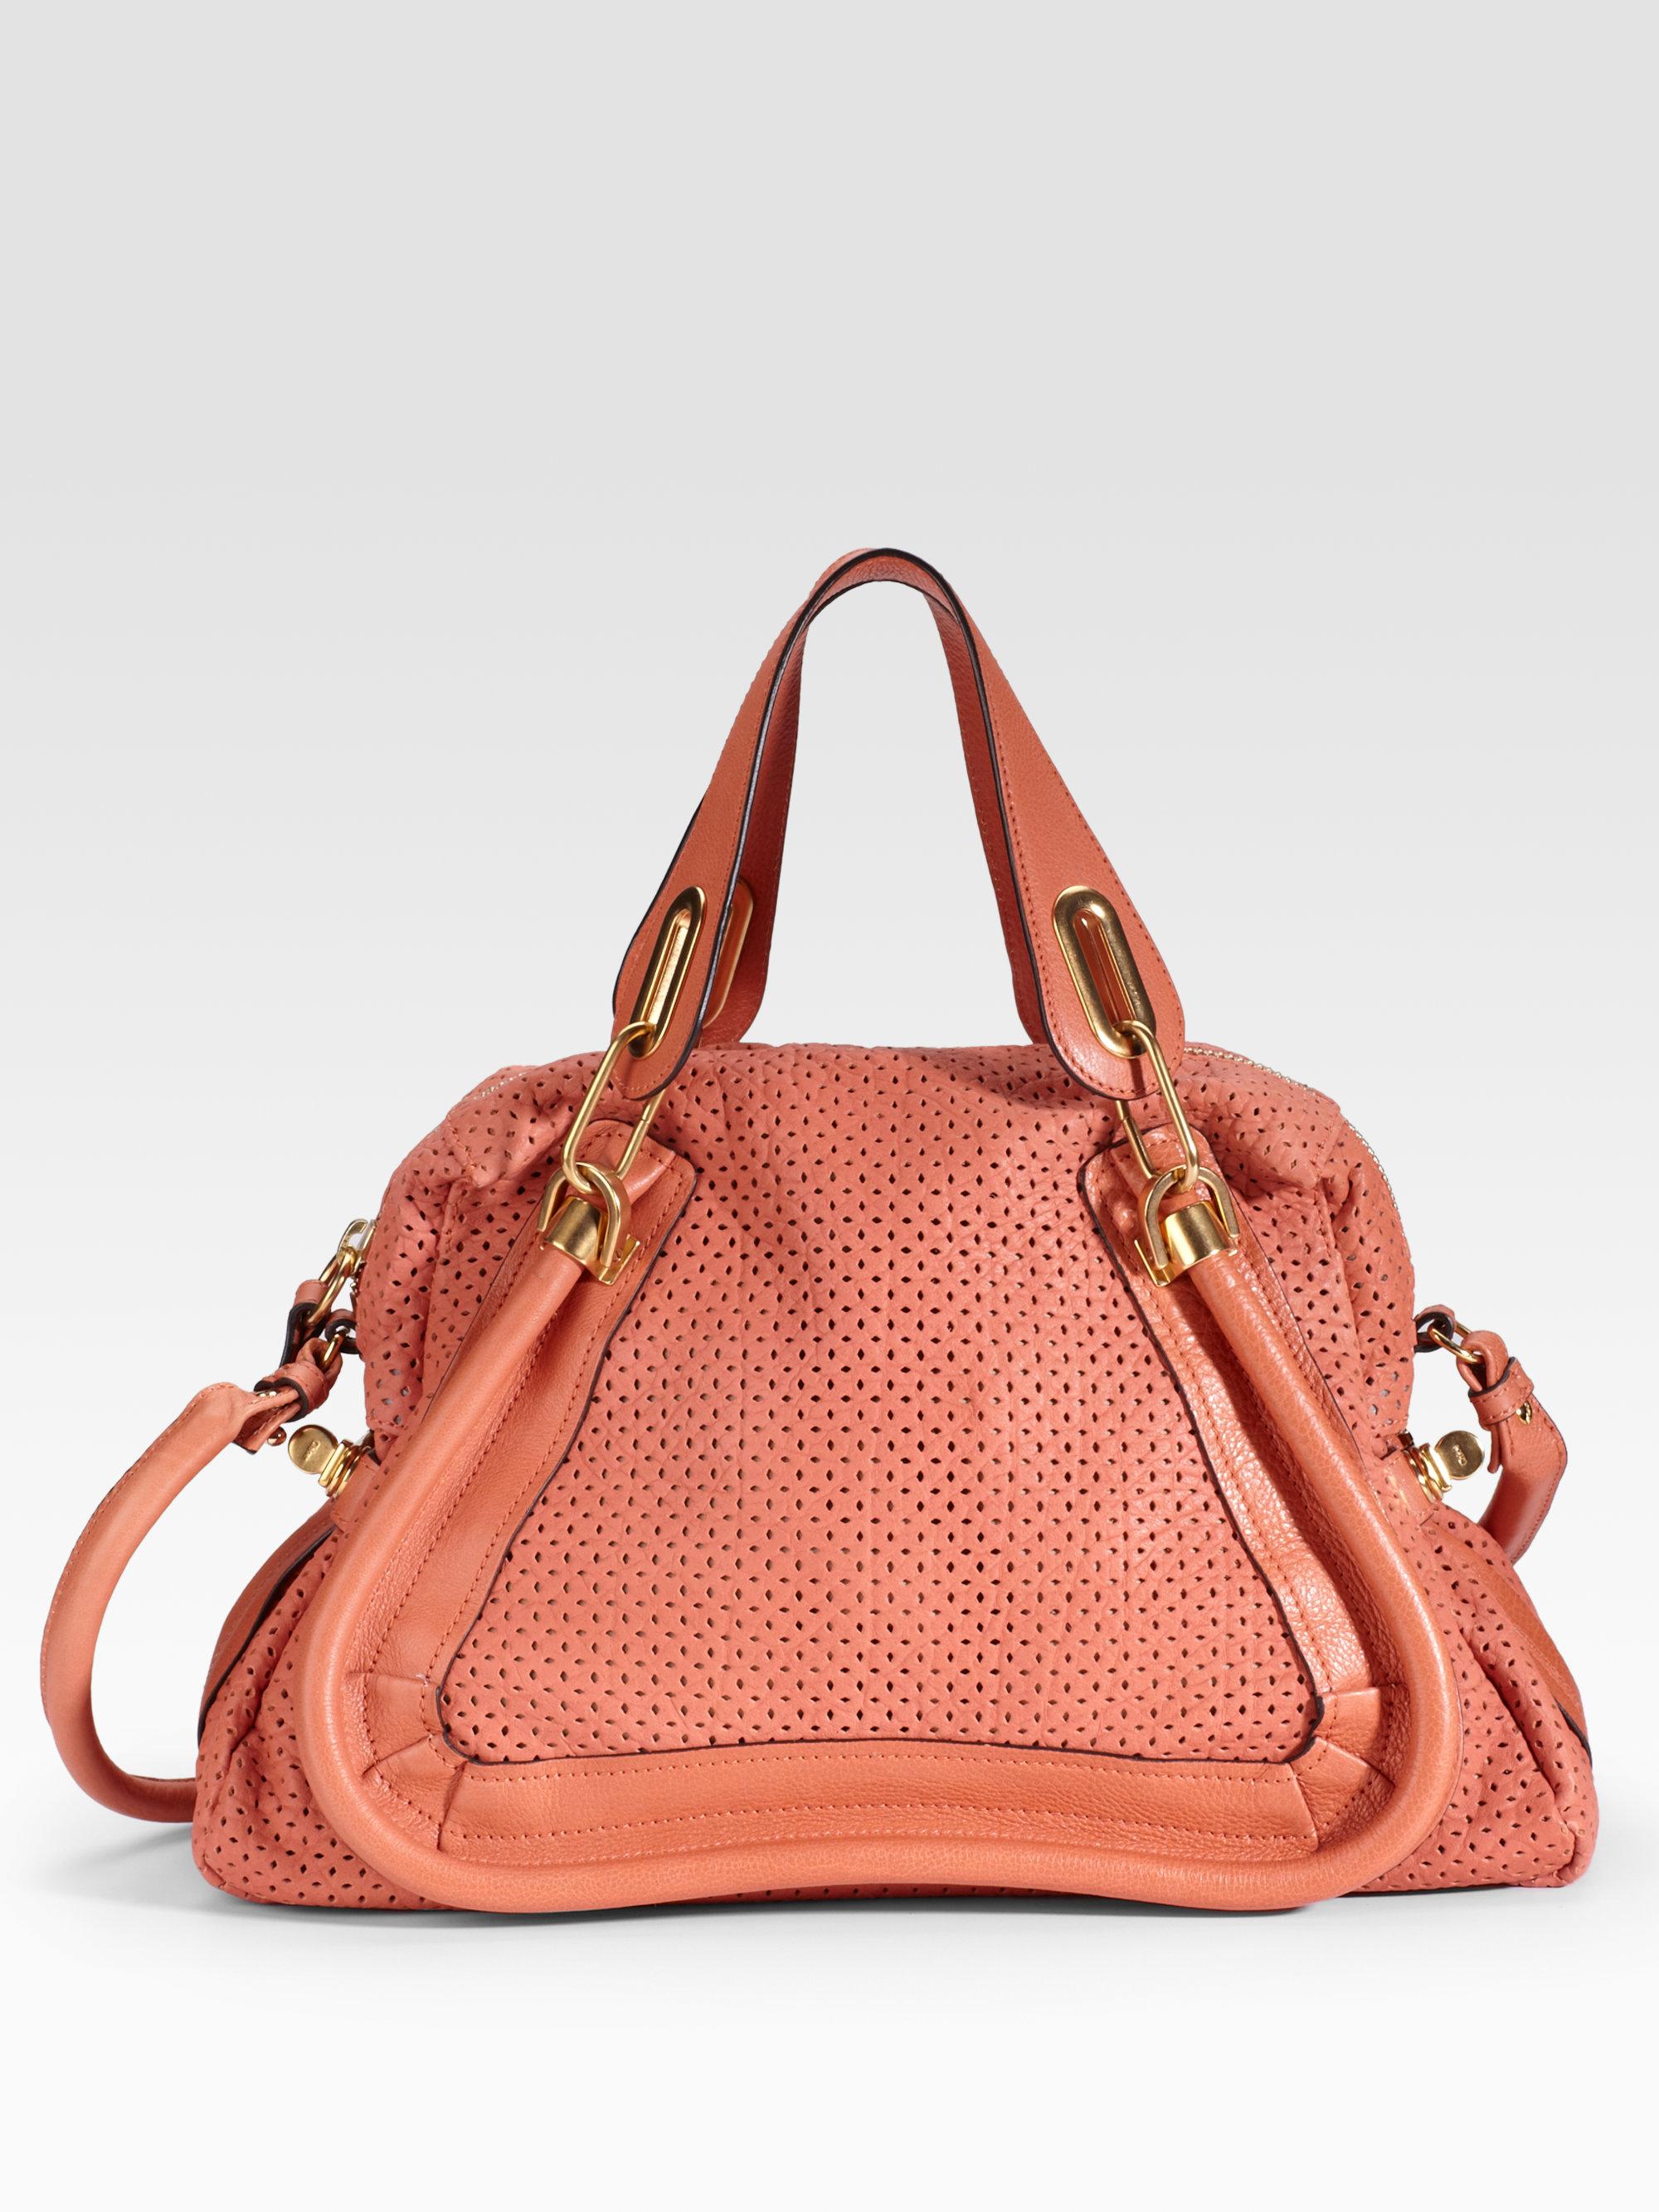 replica chloe marcie bag - chloe medium paraty tote, chloe shop online